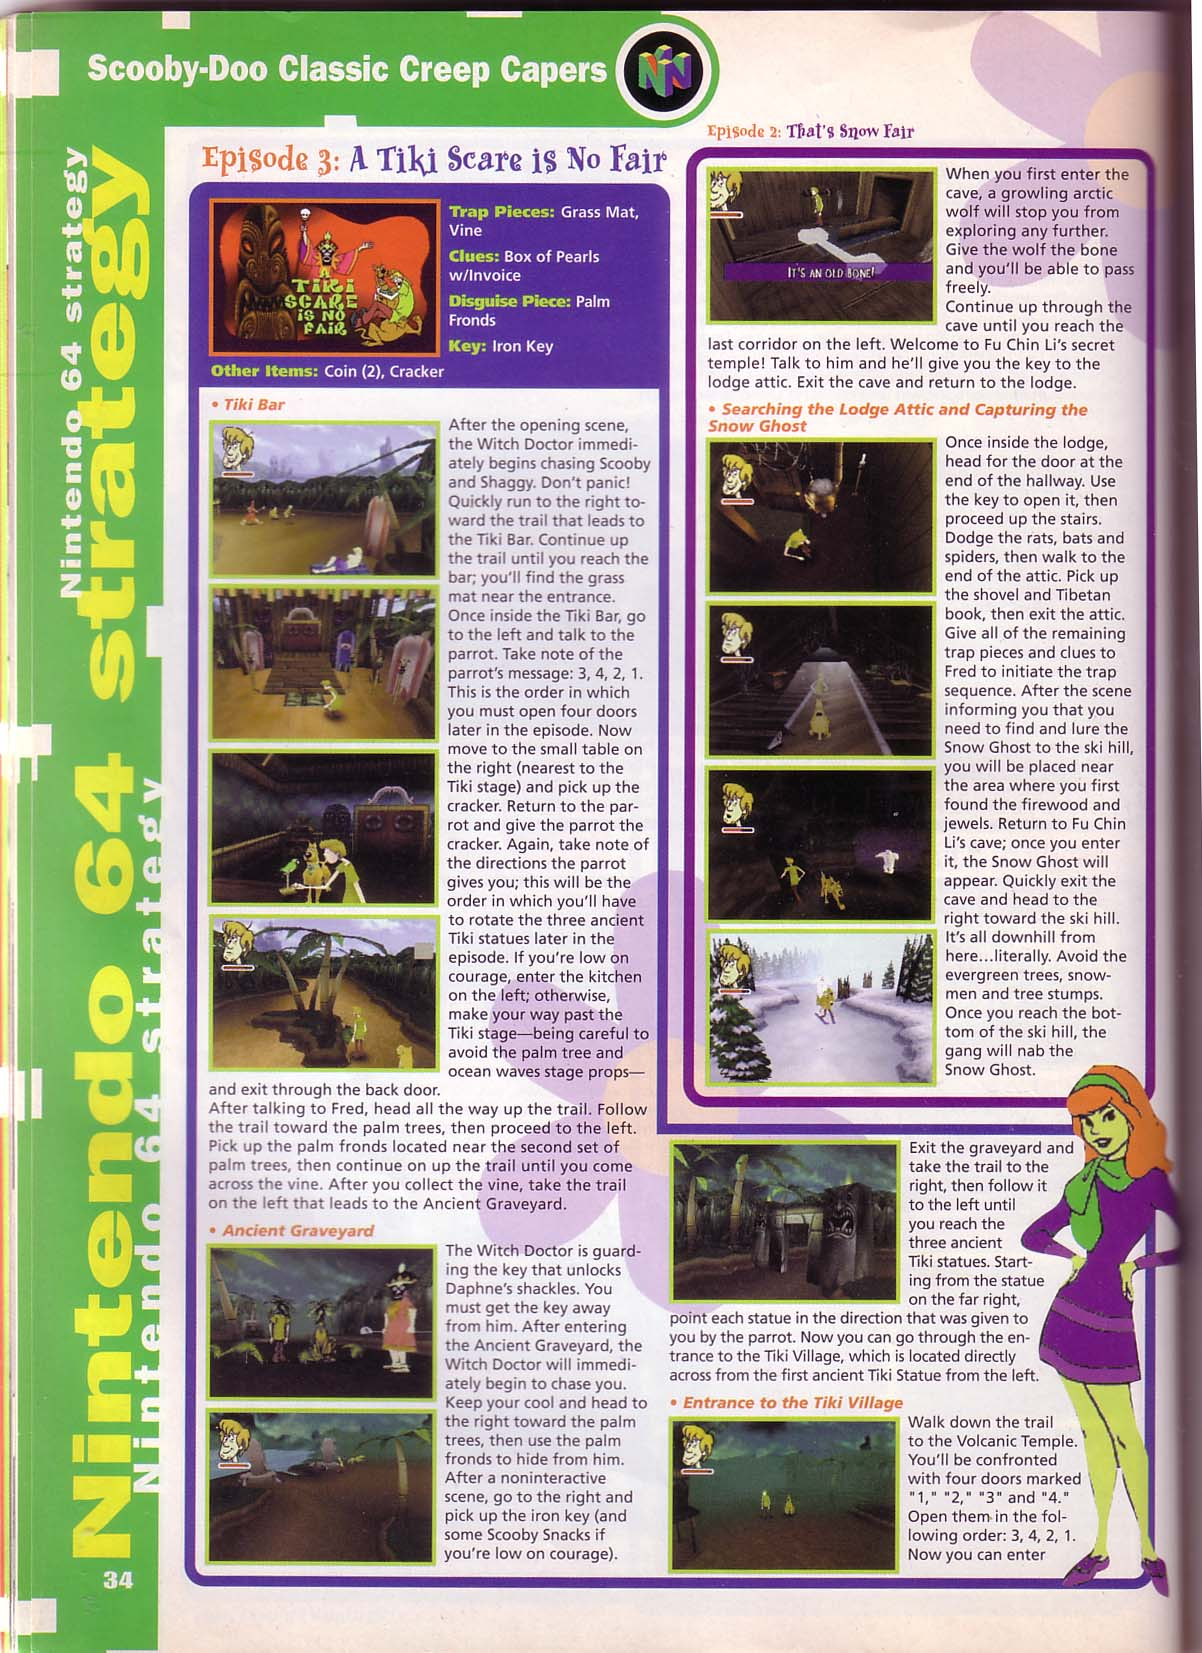 TipsandTricks_Feb_2001_ScoobyDoo_pg3_Strategy.jpg